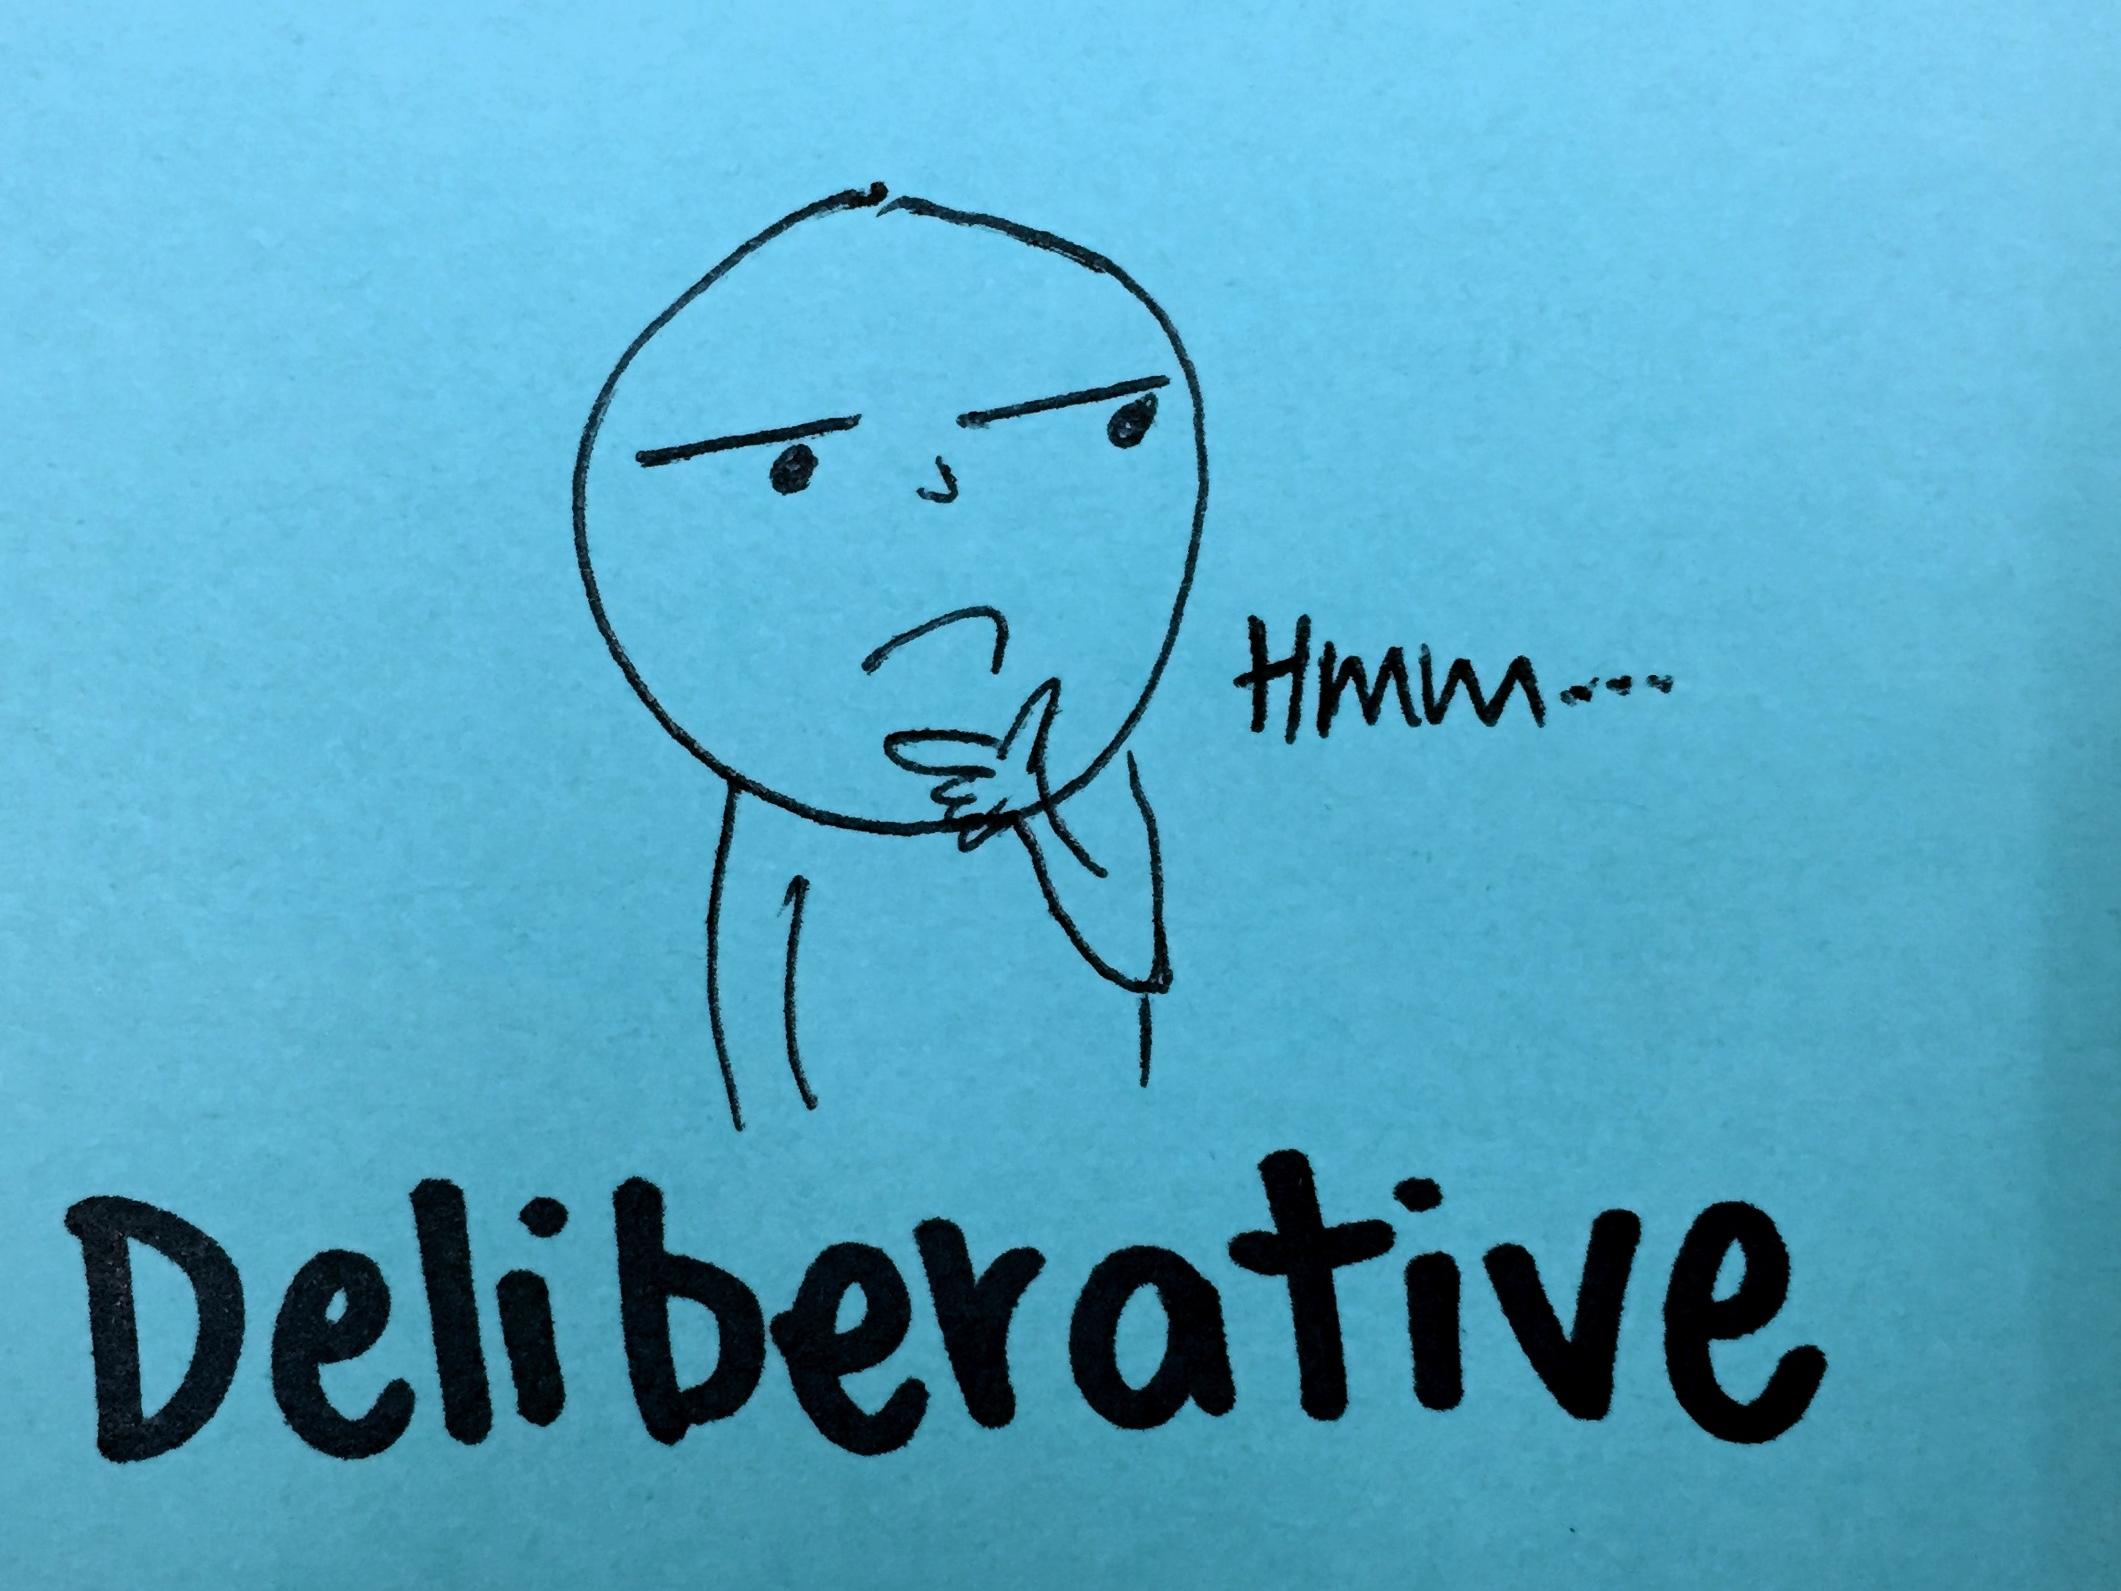 Deliberative StrengthsFinder Singapore Thinking Man Hmm